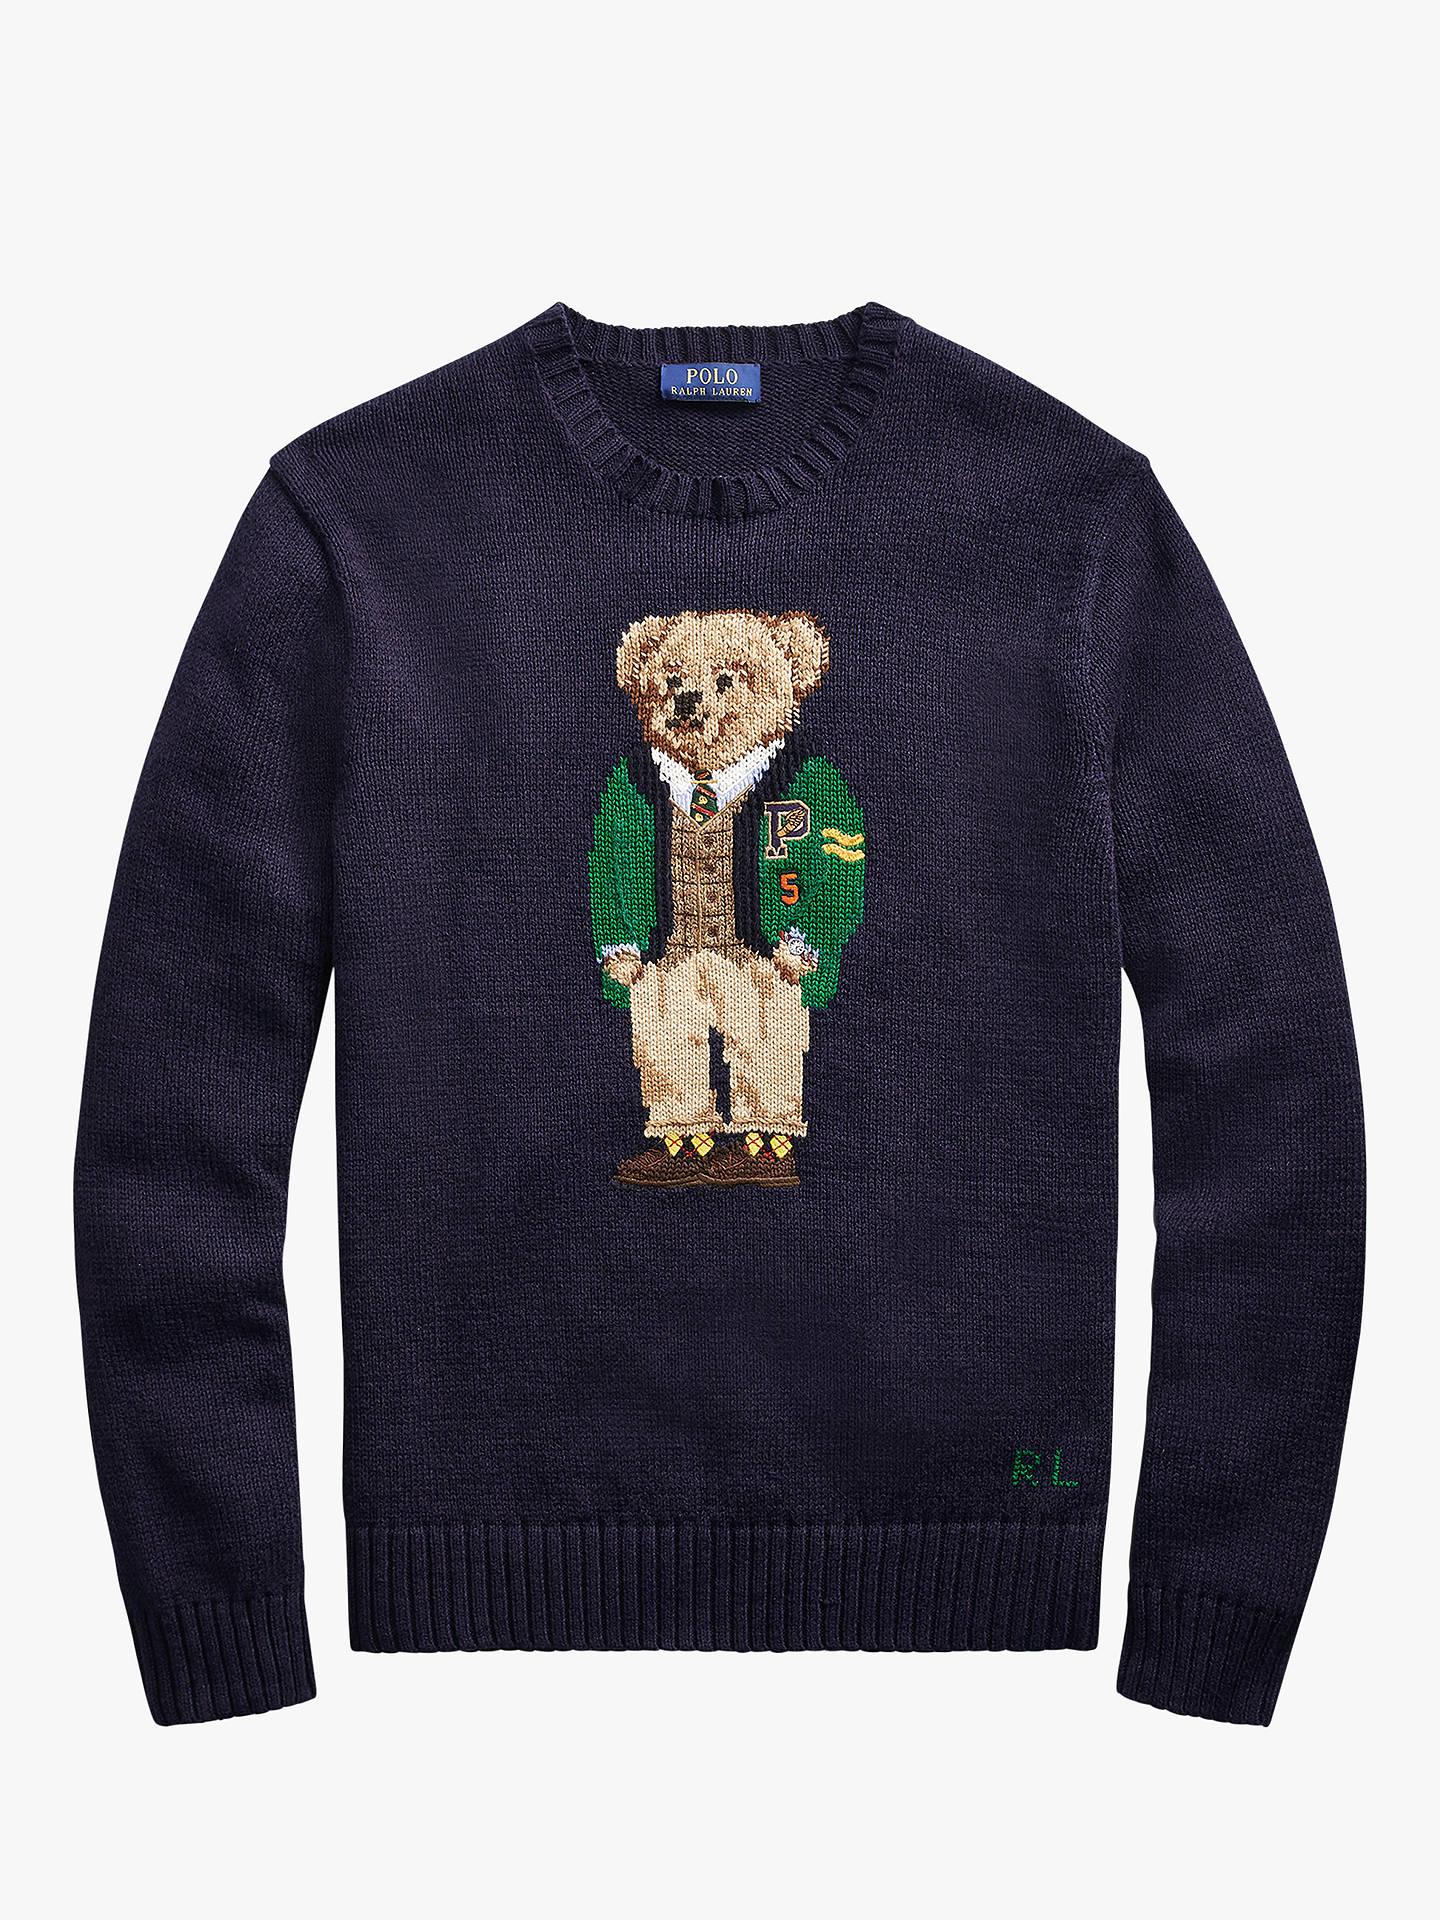 8dc2283d18b1 ... BuyPolo Ralph Lauren University Bear Sweater